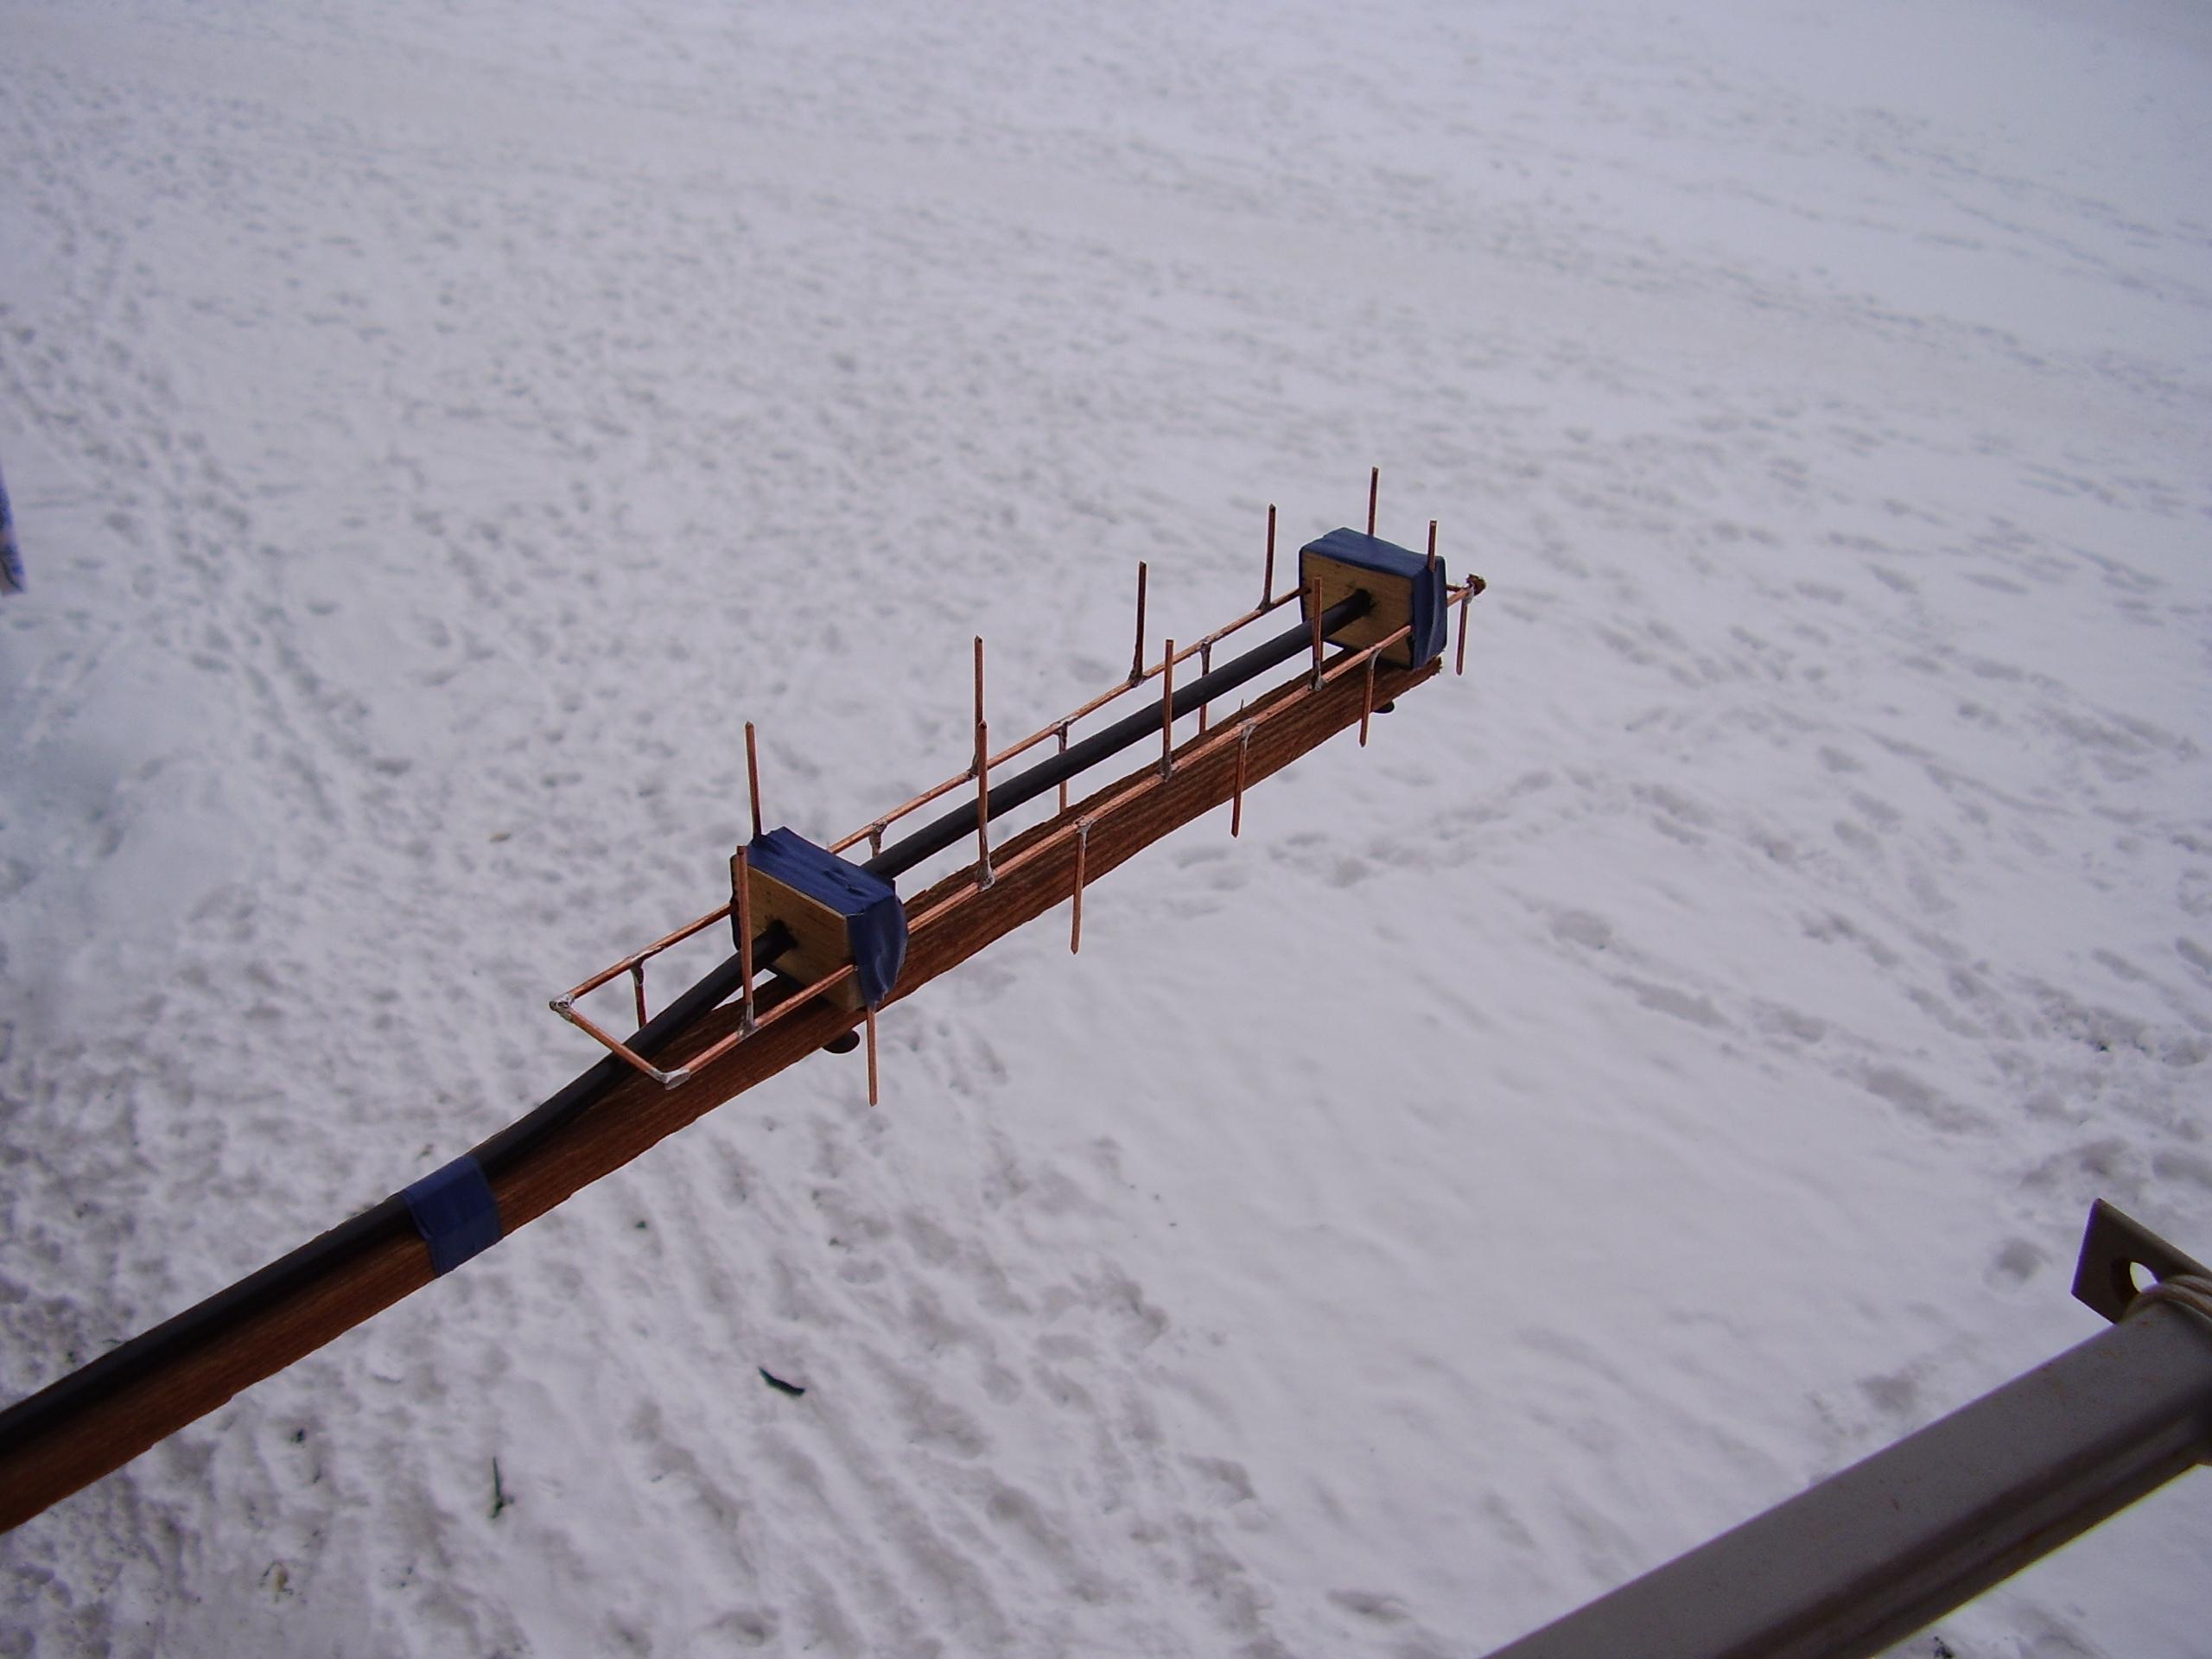 Антенны на 3g модемЦветок органзРыбалка зимние блеснКак